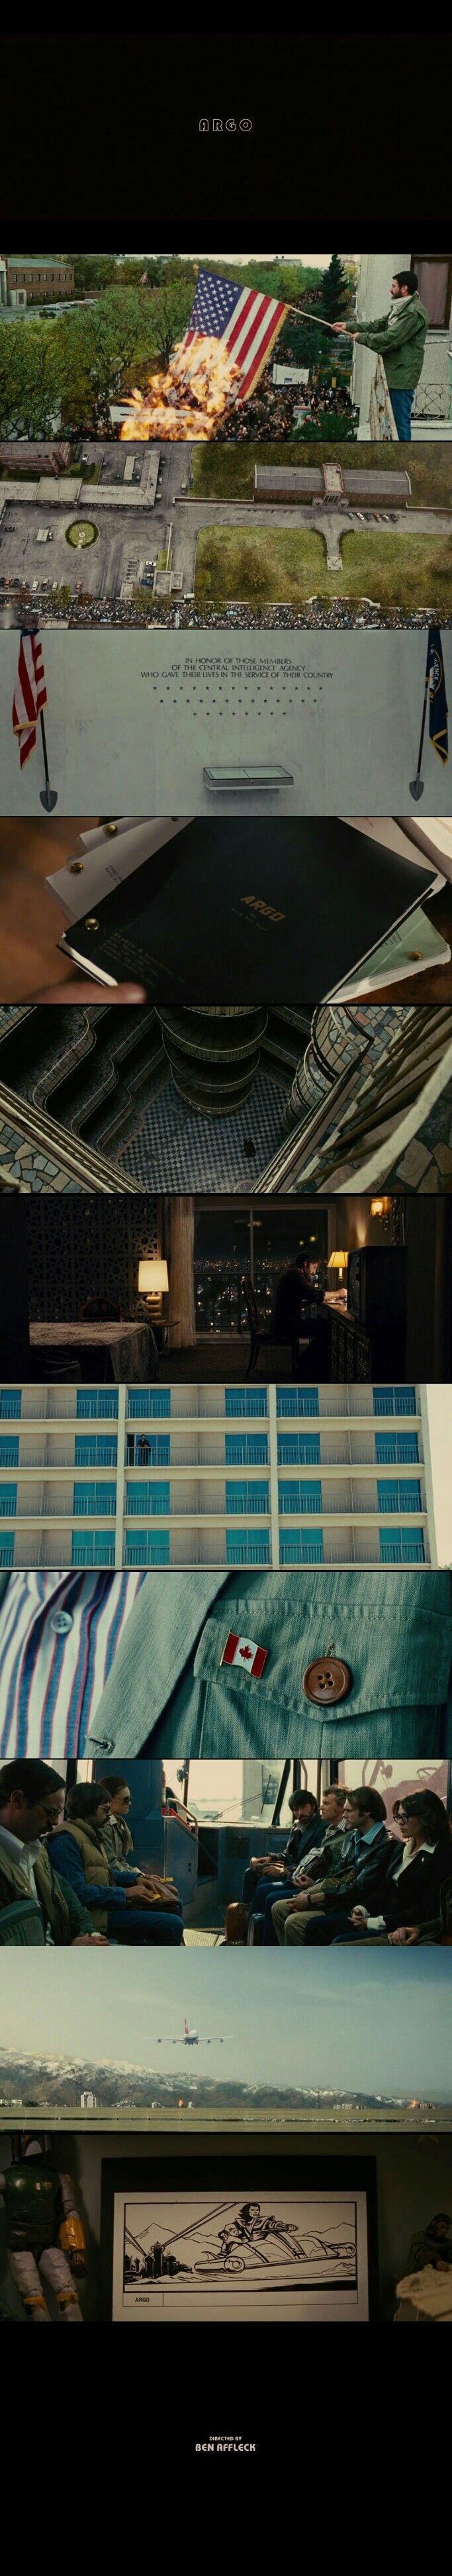 Argo(2012) Directed by Ben Affleck.